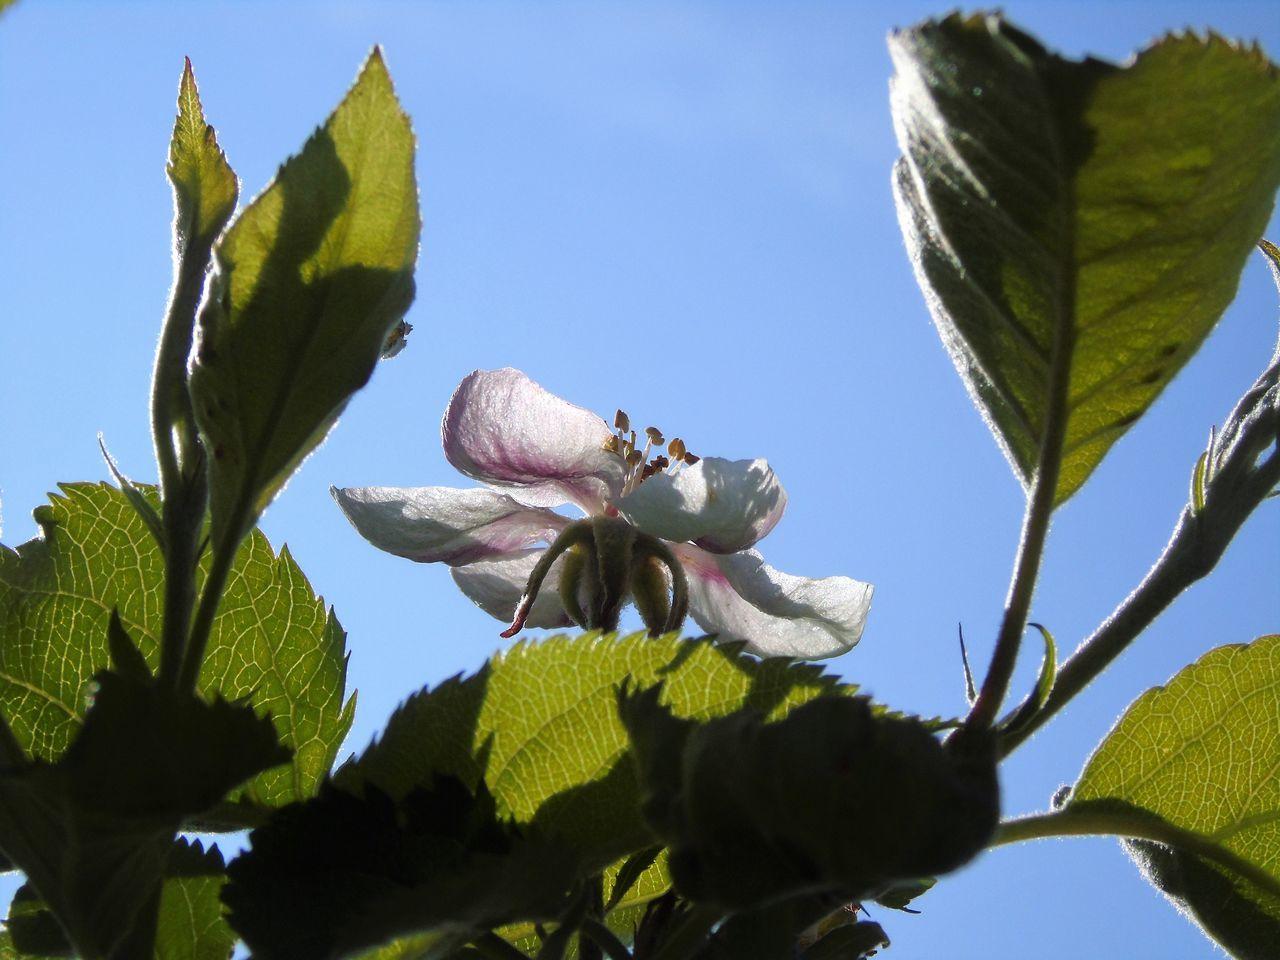 Apfelblüte Enjoying Life Enjoying The Sun EyeEm Best Shots EyeEm Nature Lover Hello World I Like This Shot I LIKE👍EyeEm😃👍 I LOVE PHOTOGRAPHY Single Flower Springtime Sunnyday☀️ Taking Photos Waiting For A Bee